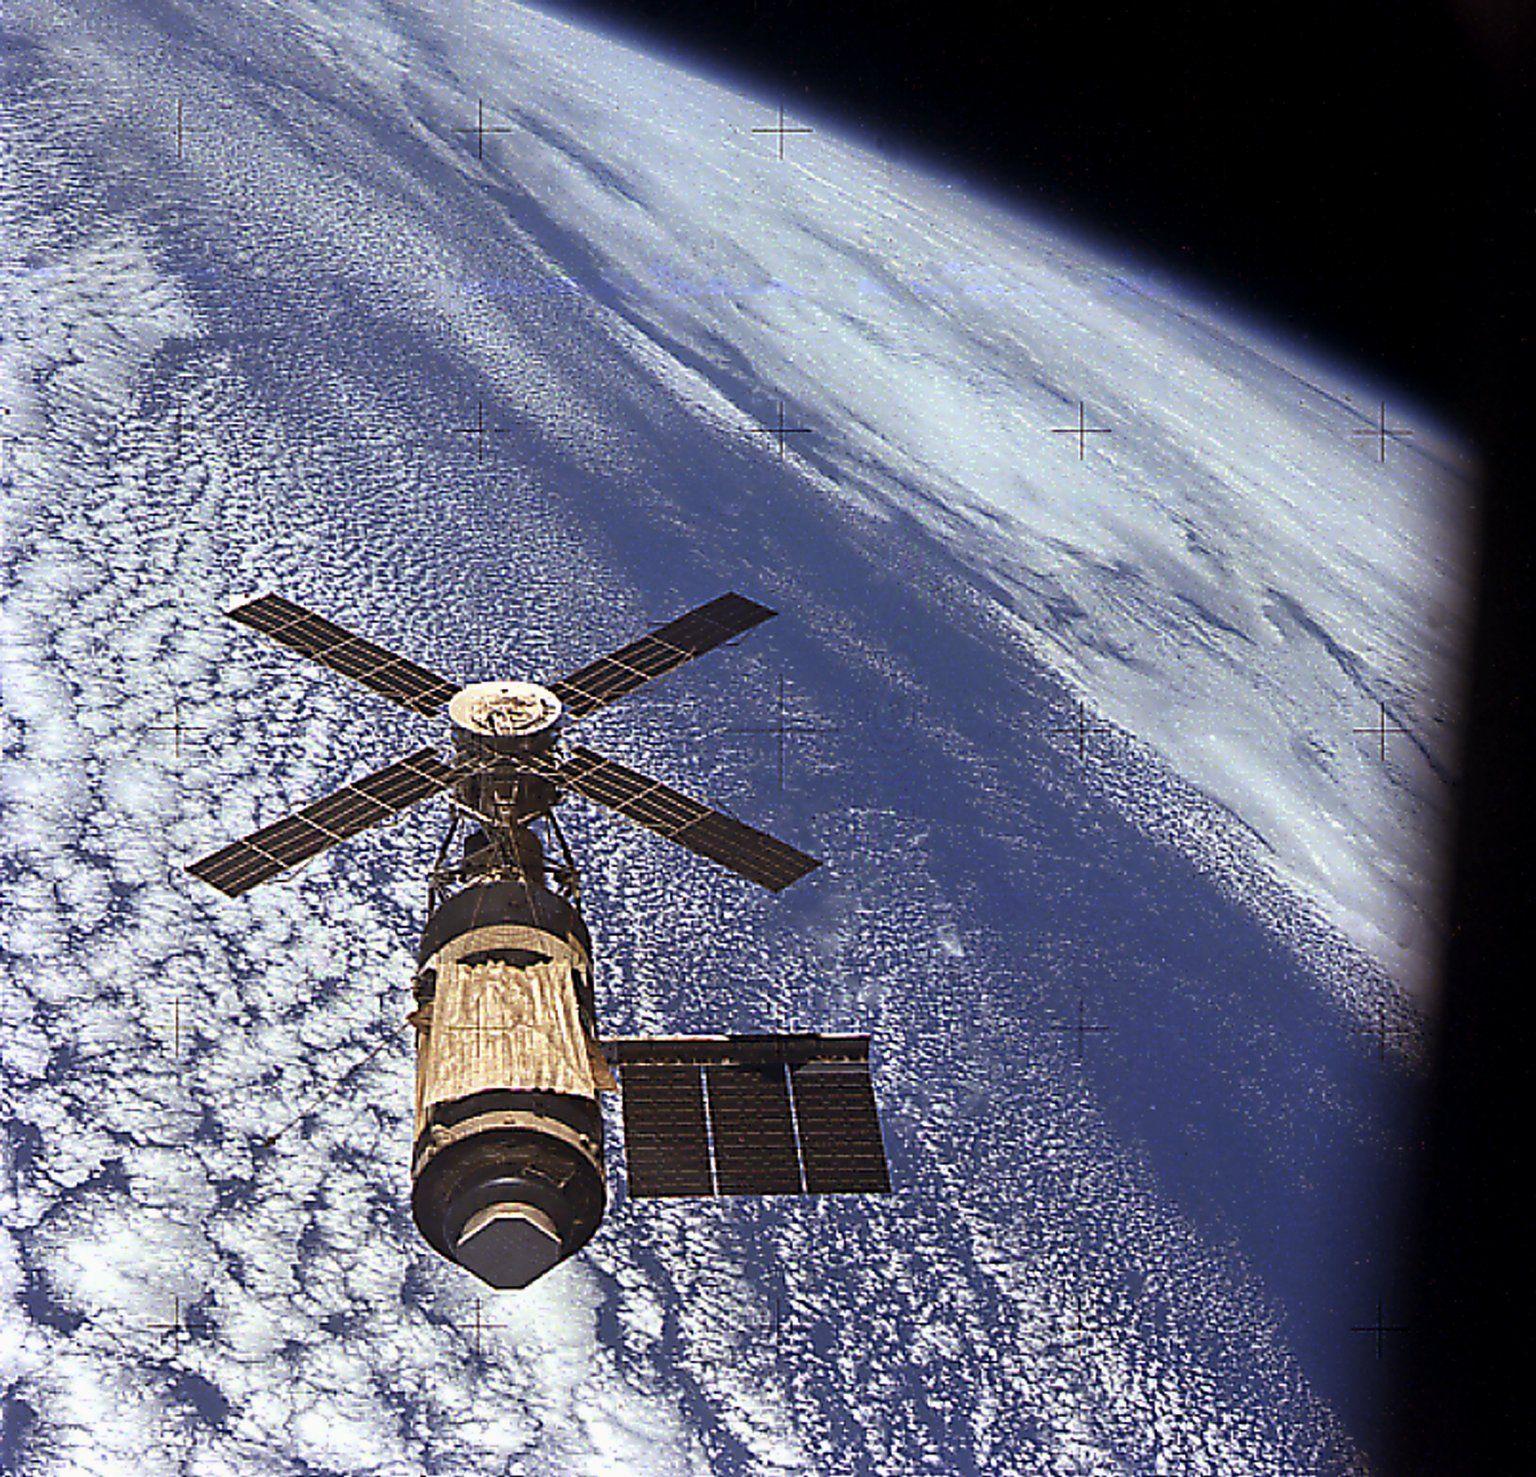 Skylab NASA/Marshall Space Flight Center Free Download